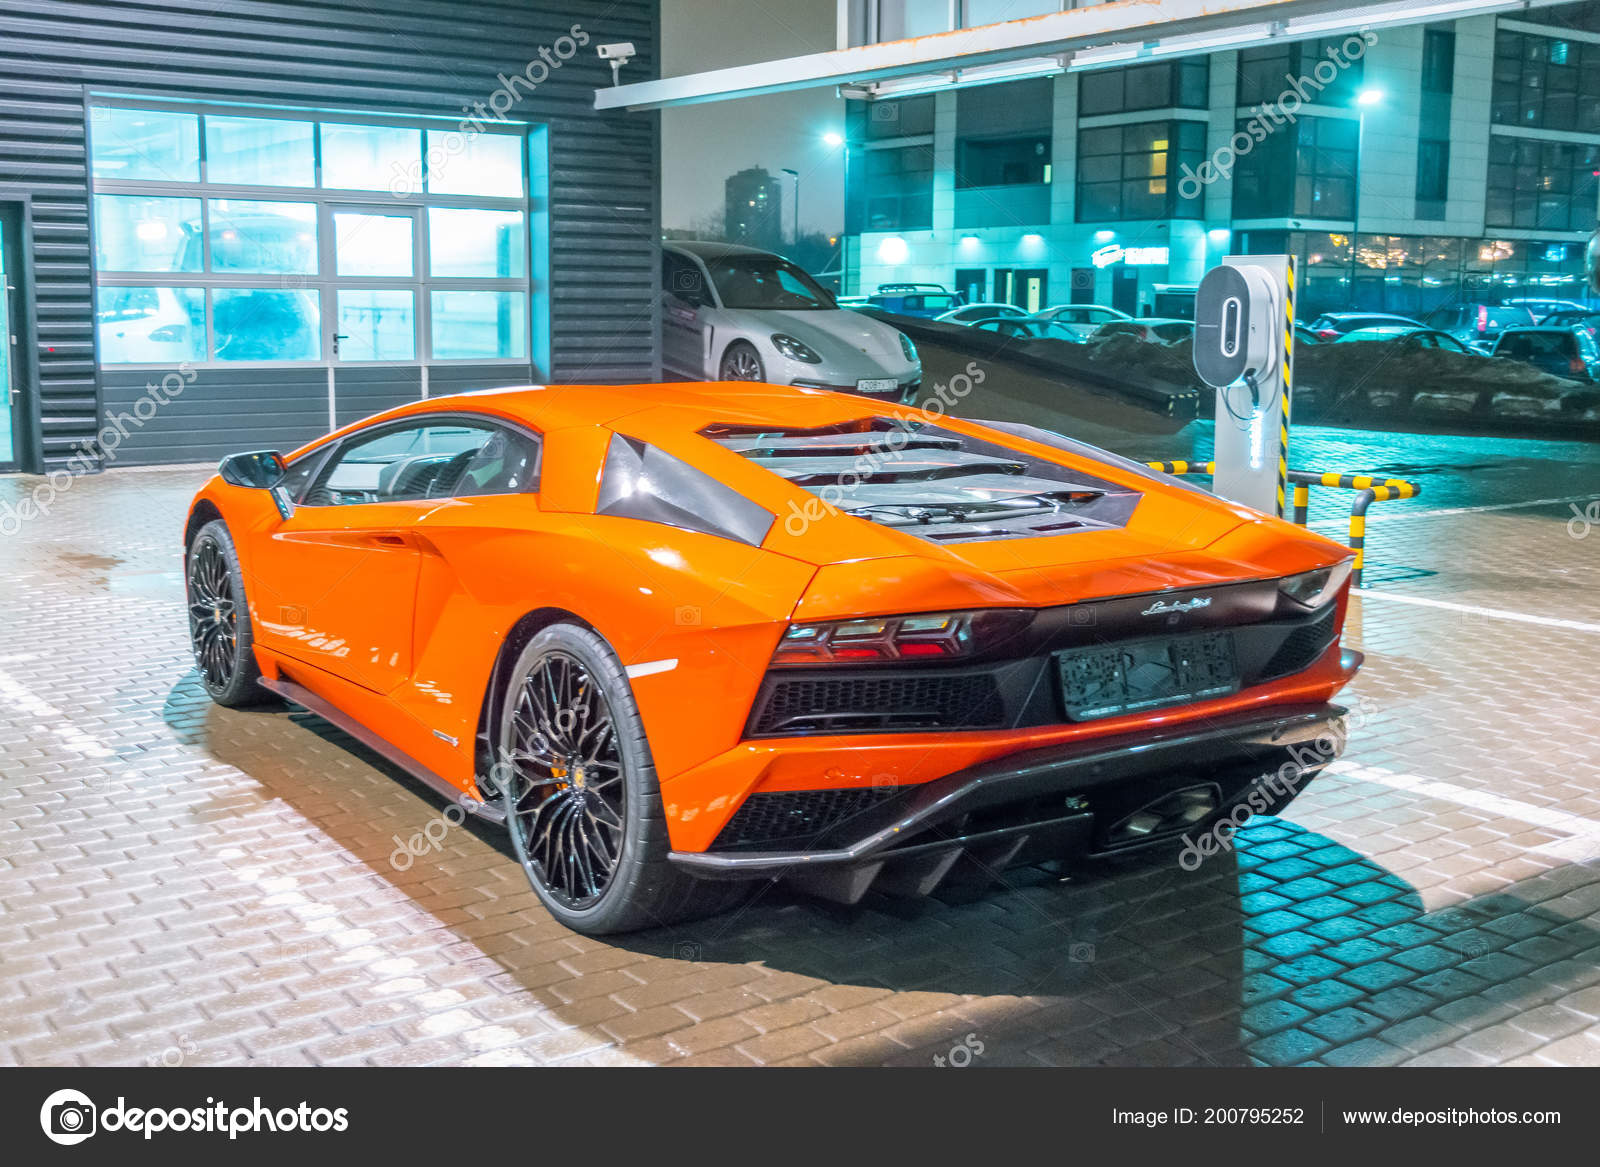 Lamborghini Aventador Orange Night Streets City Parking Place Russia Saint Stock Editorial Photo C Aapsky 200795252